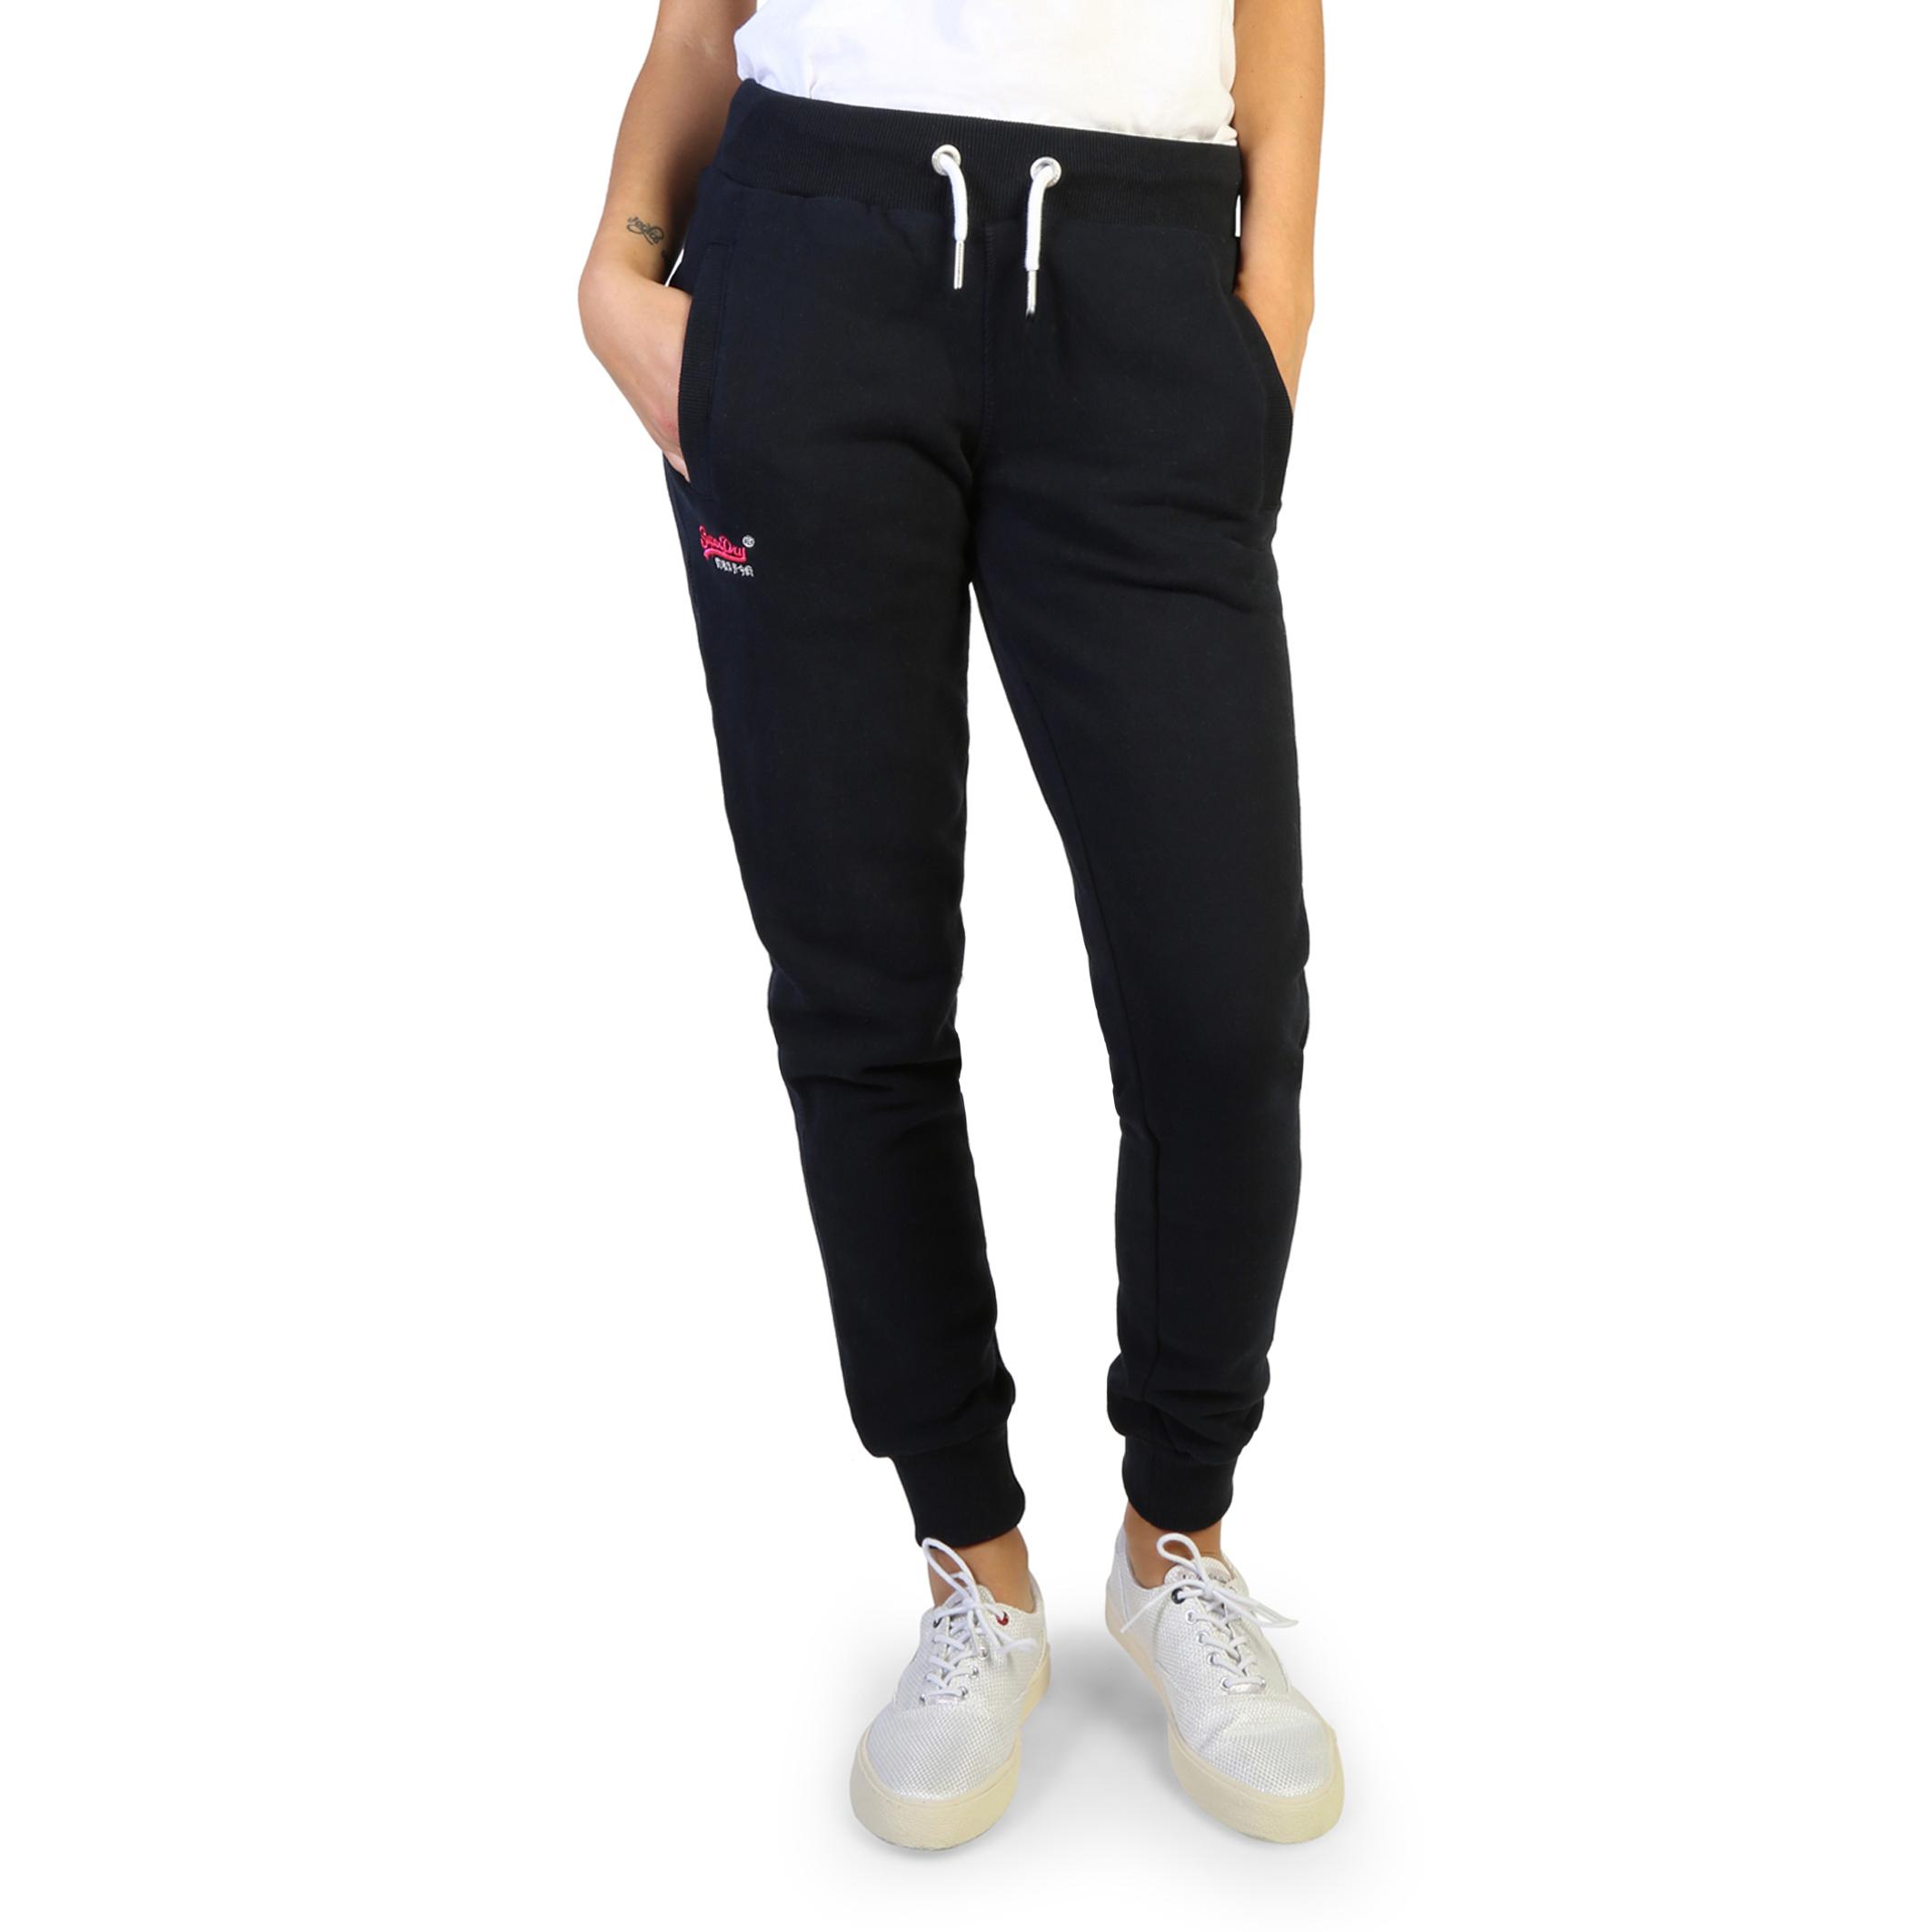 Pantaloni tuta Superdry G70023NS Donna Blu 103707